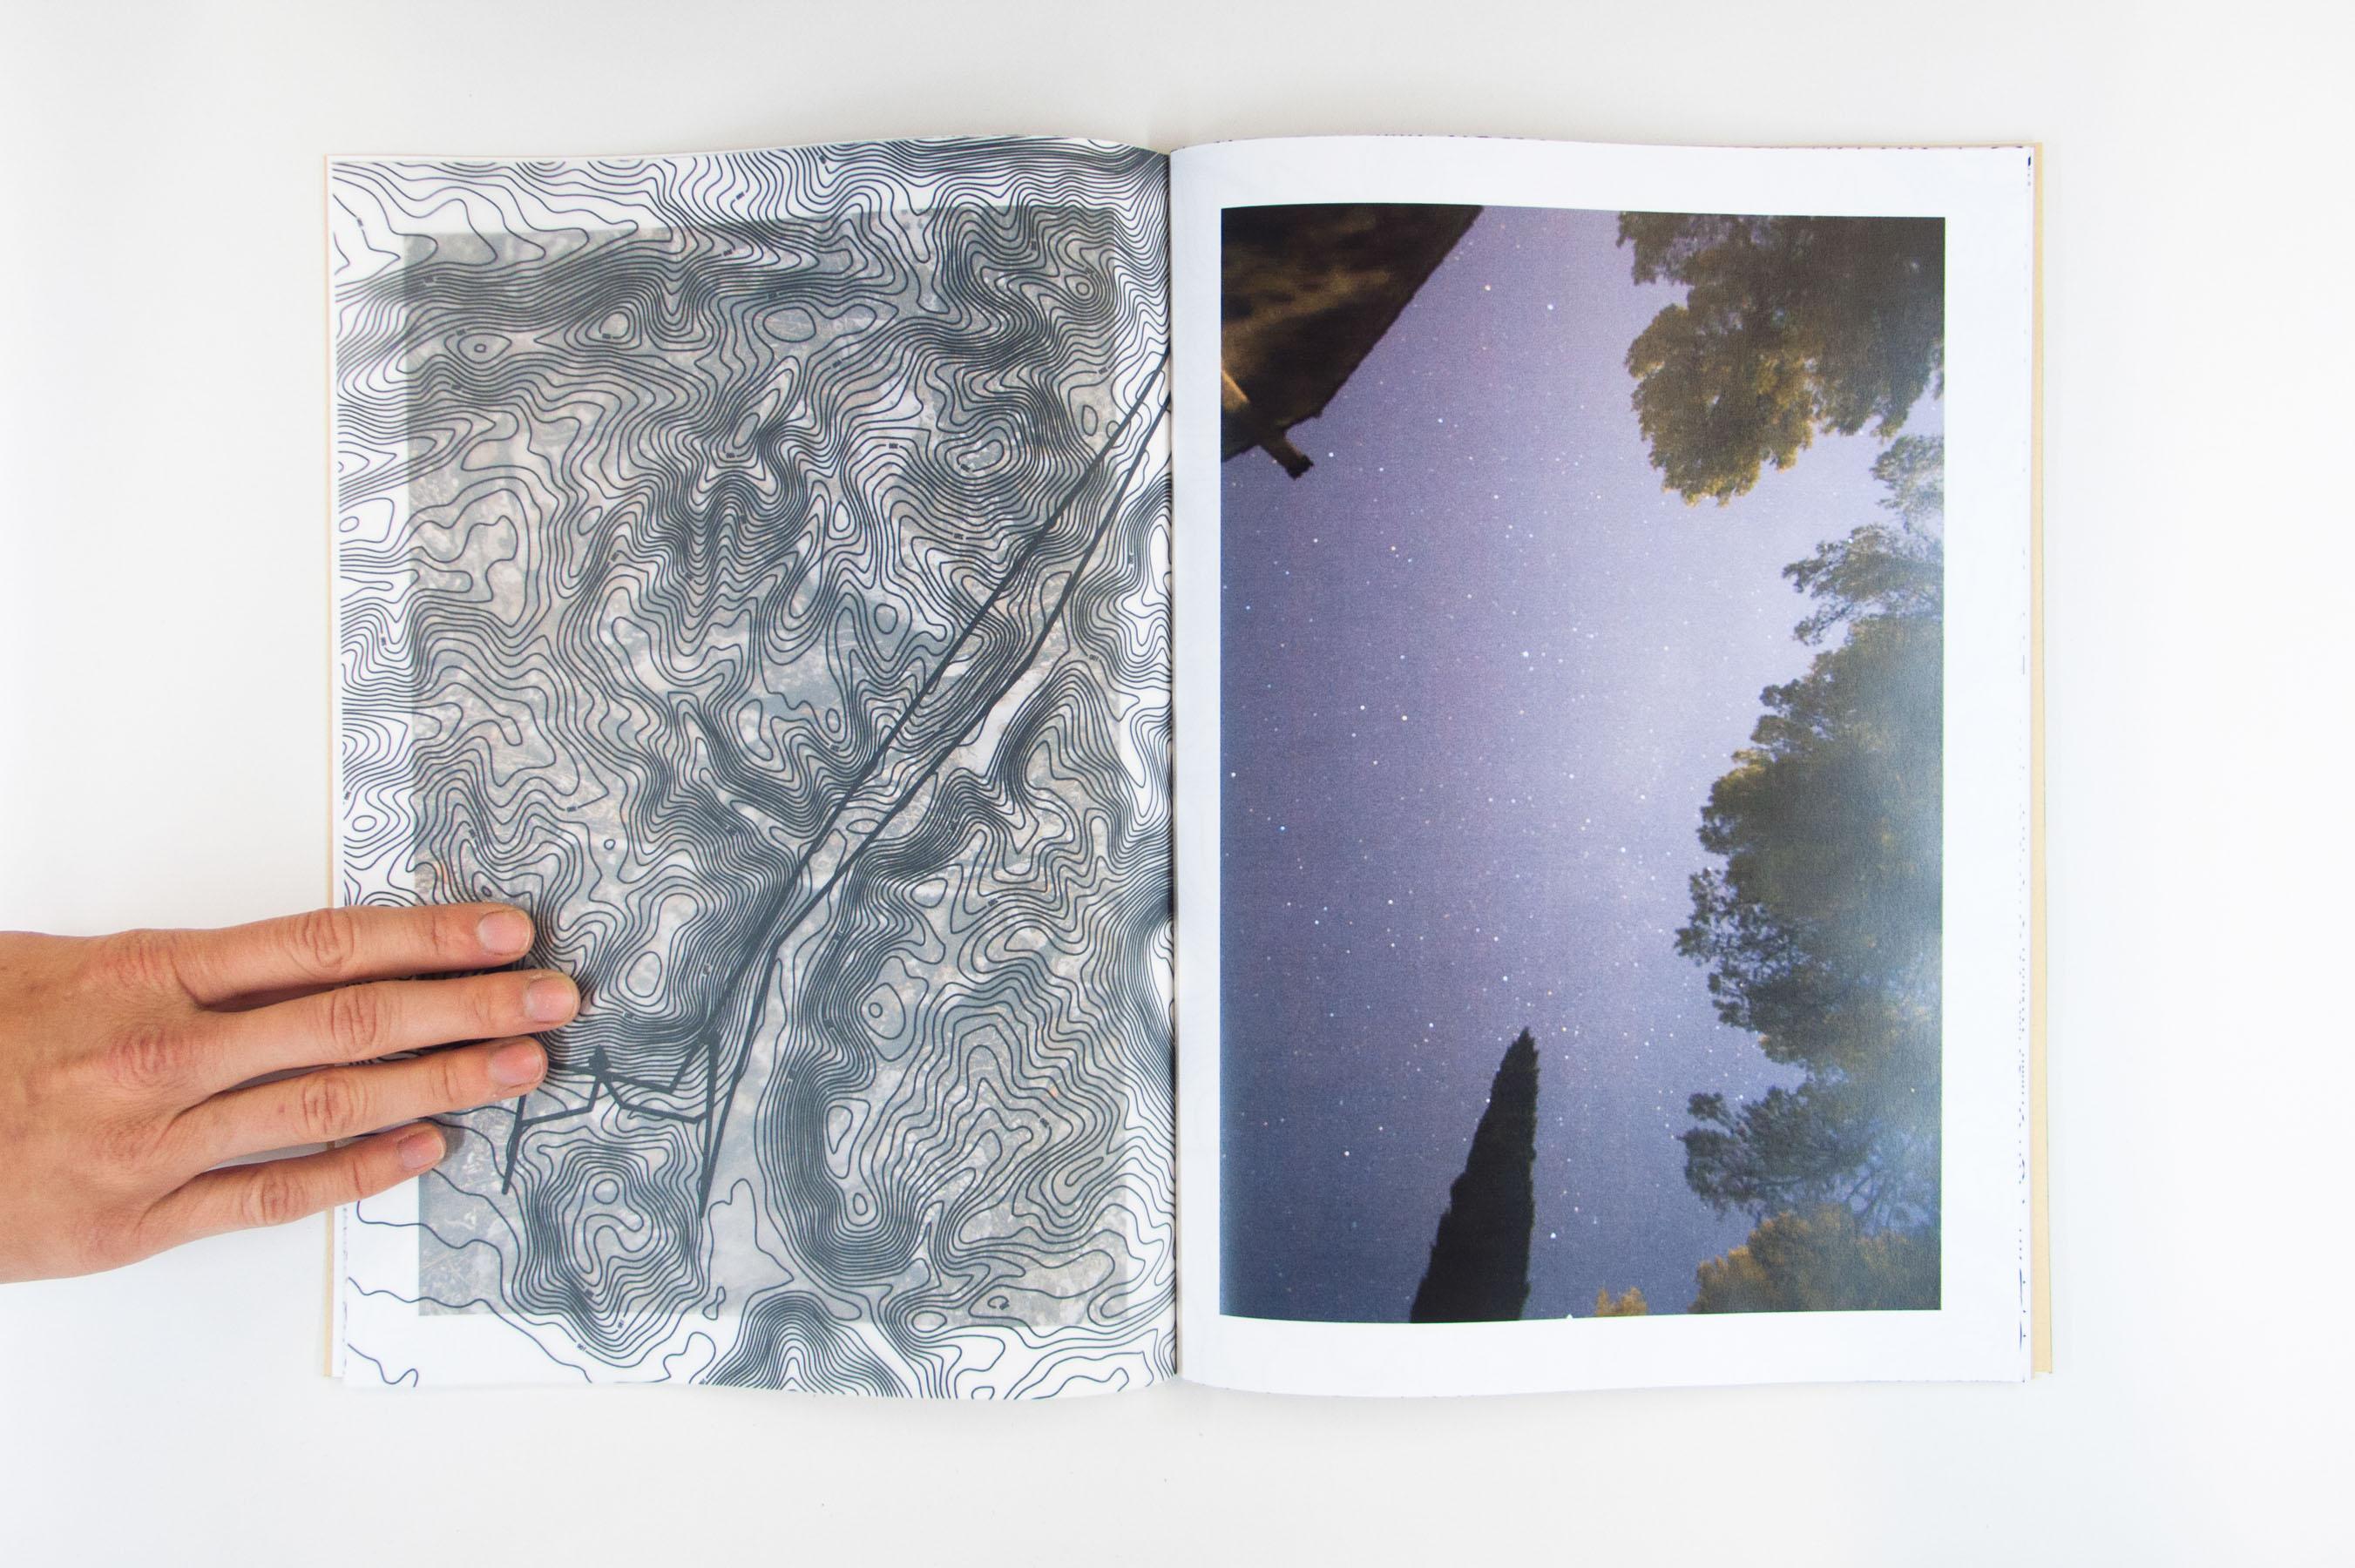 Elena Khurtova Looking for the Ursa Major – publication